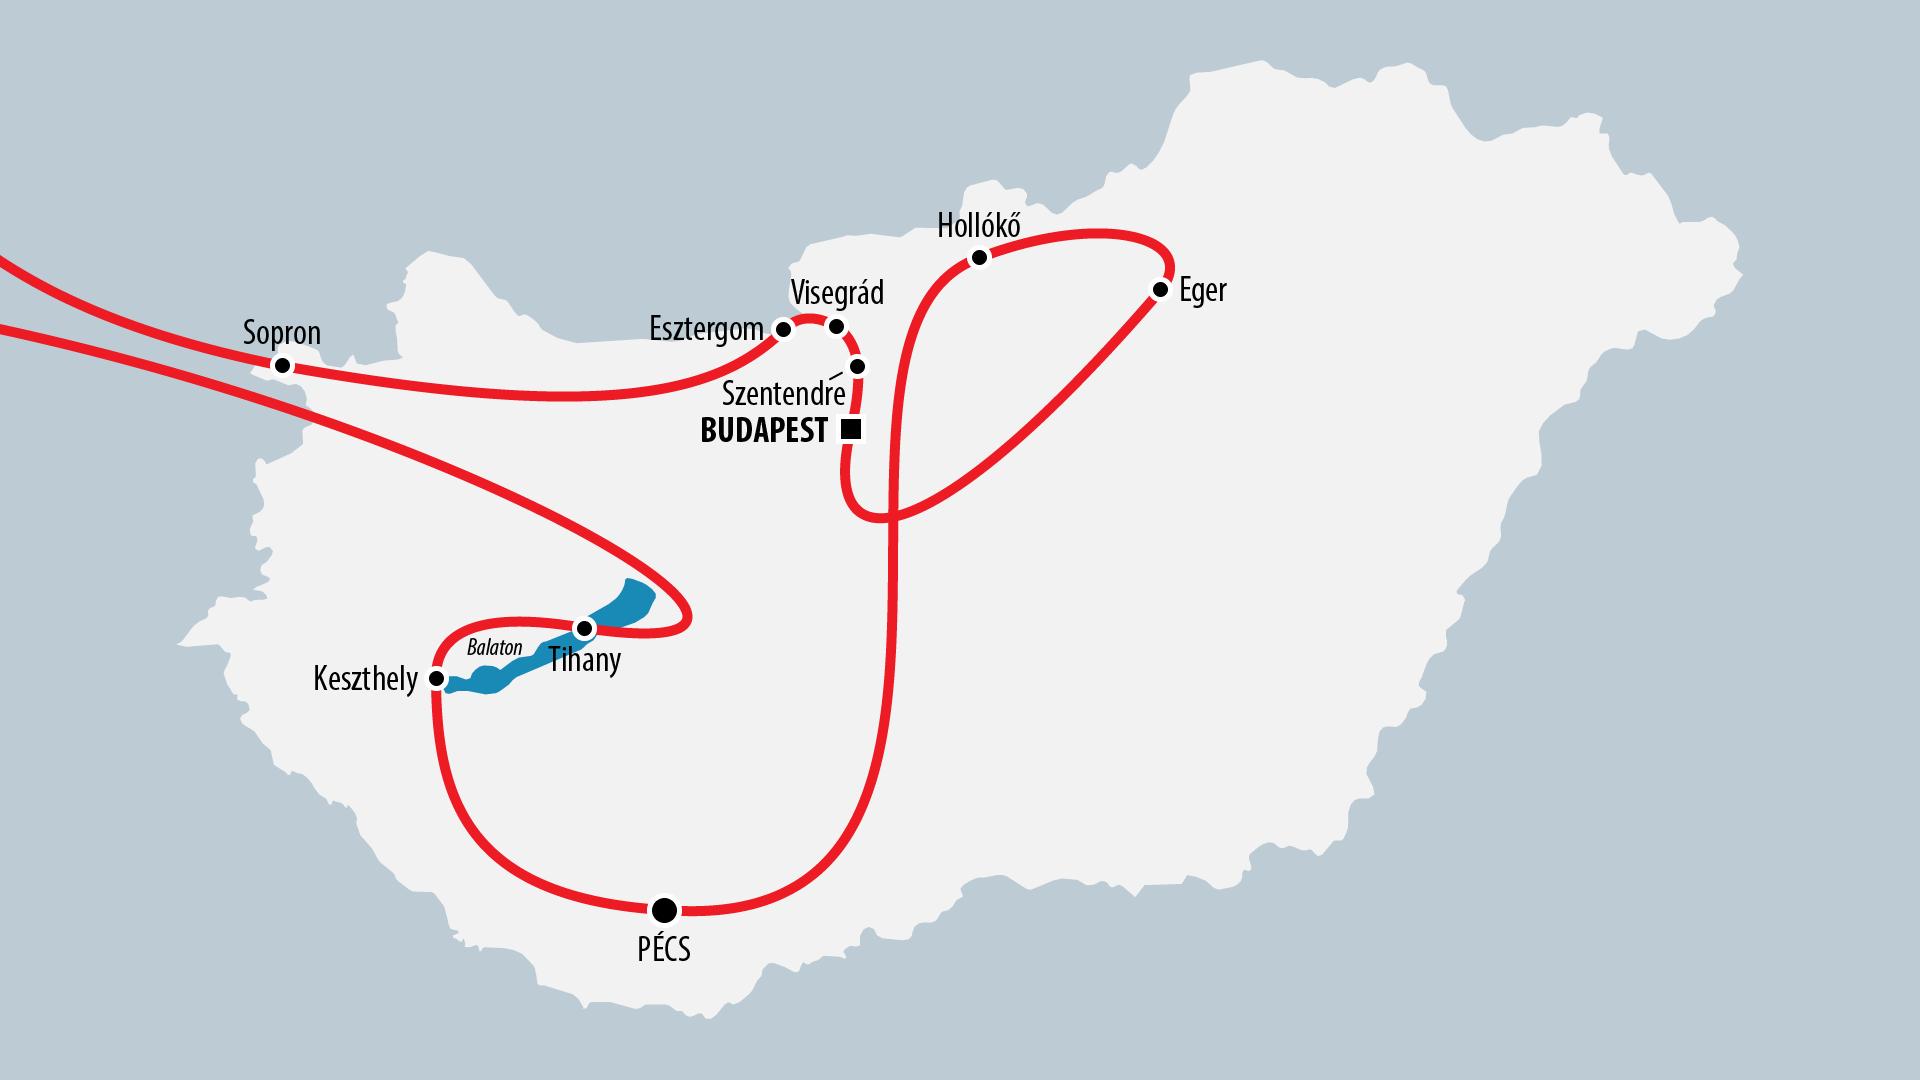 Reiseroute Ungarn 2016